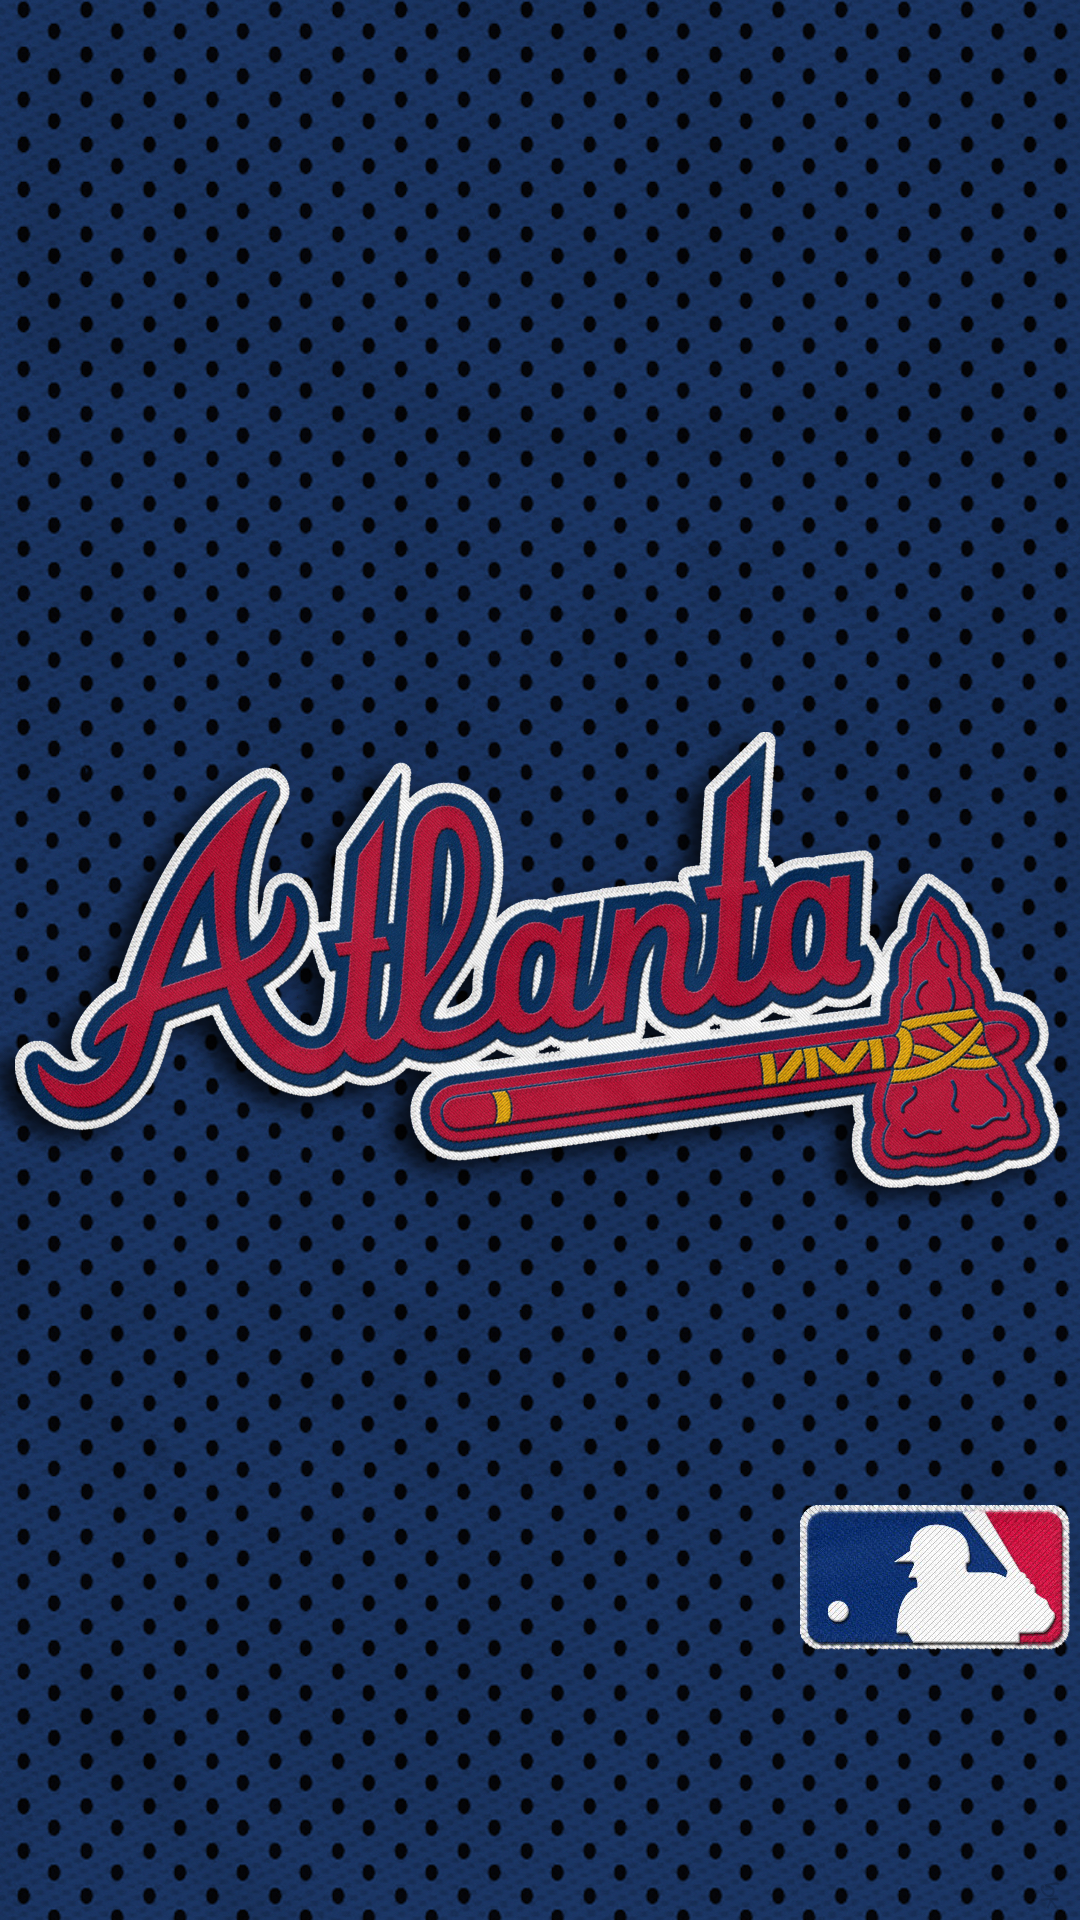 Image by Priscilla Hernandez on Baseball Atlanta braves